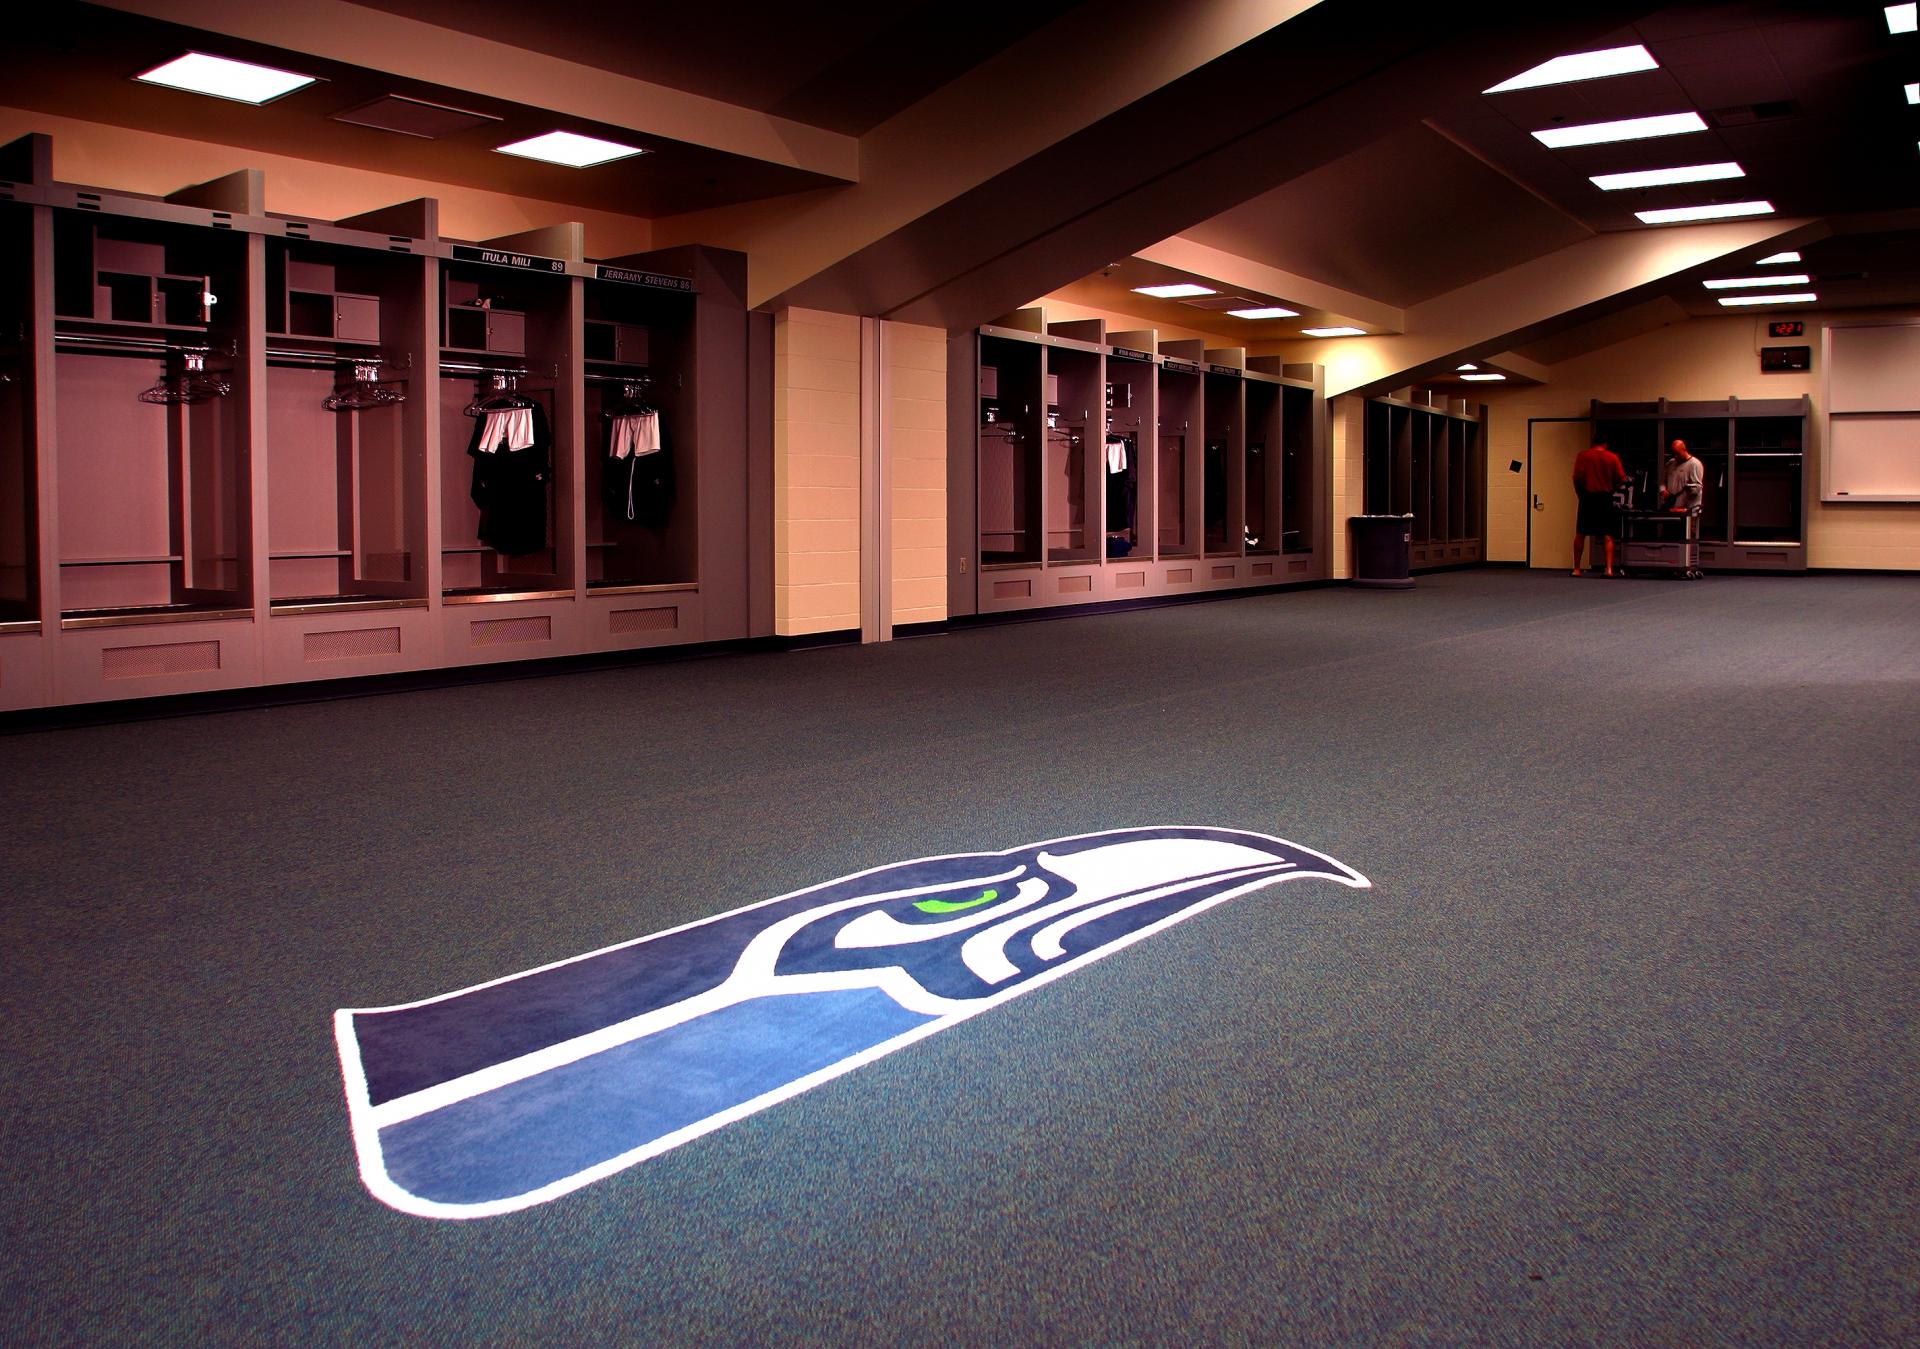 Seahawks Stadium & Exhibition Center Photo